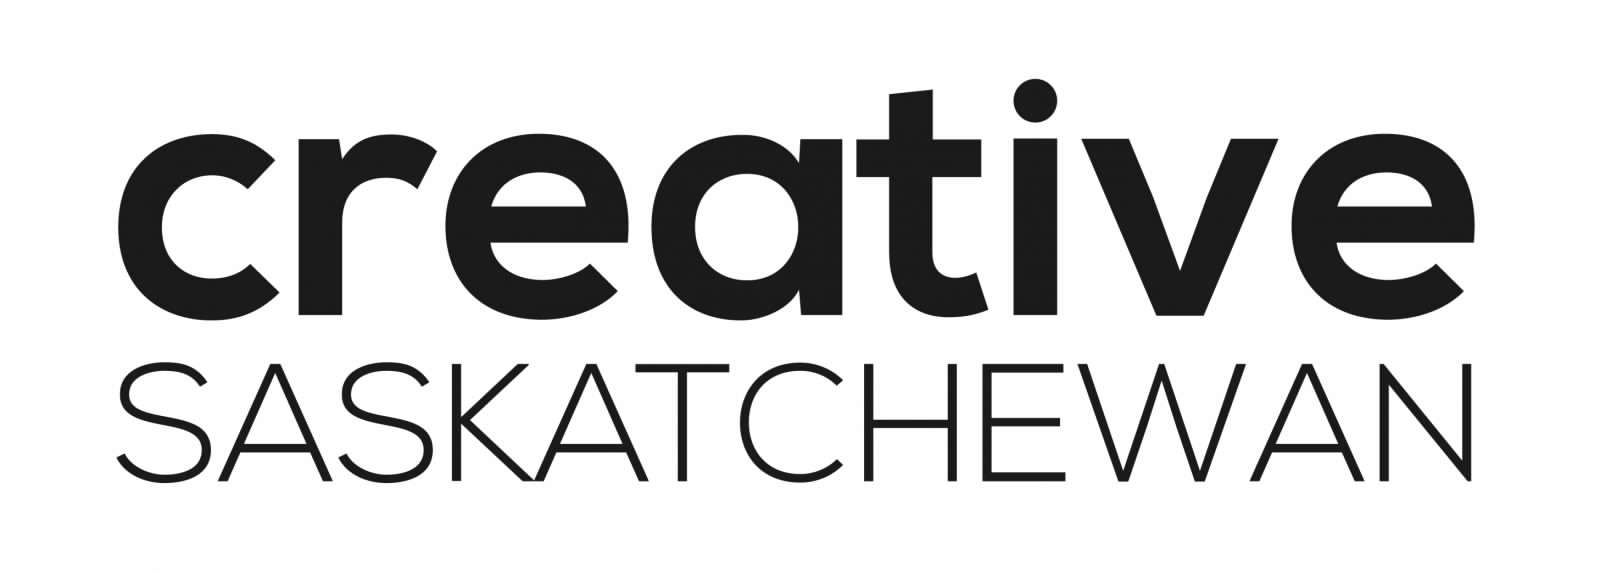 Creative sask logo.jpg